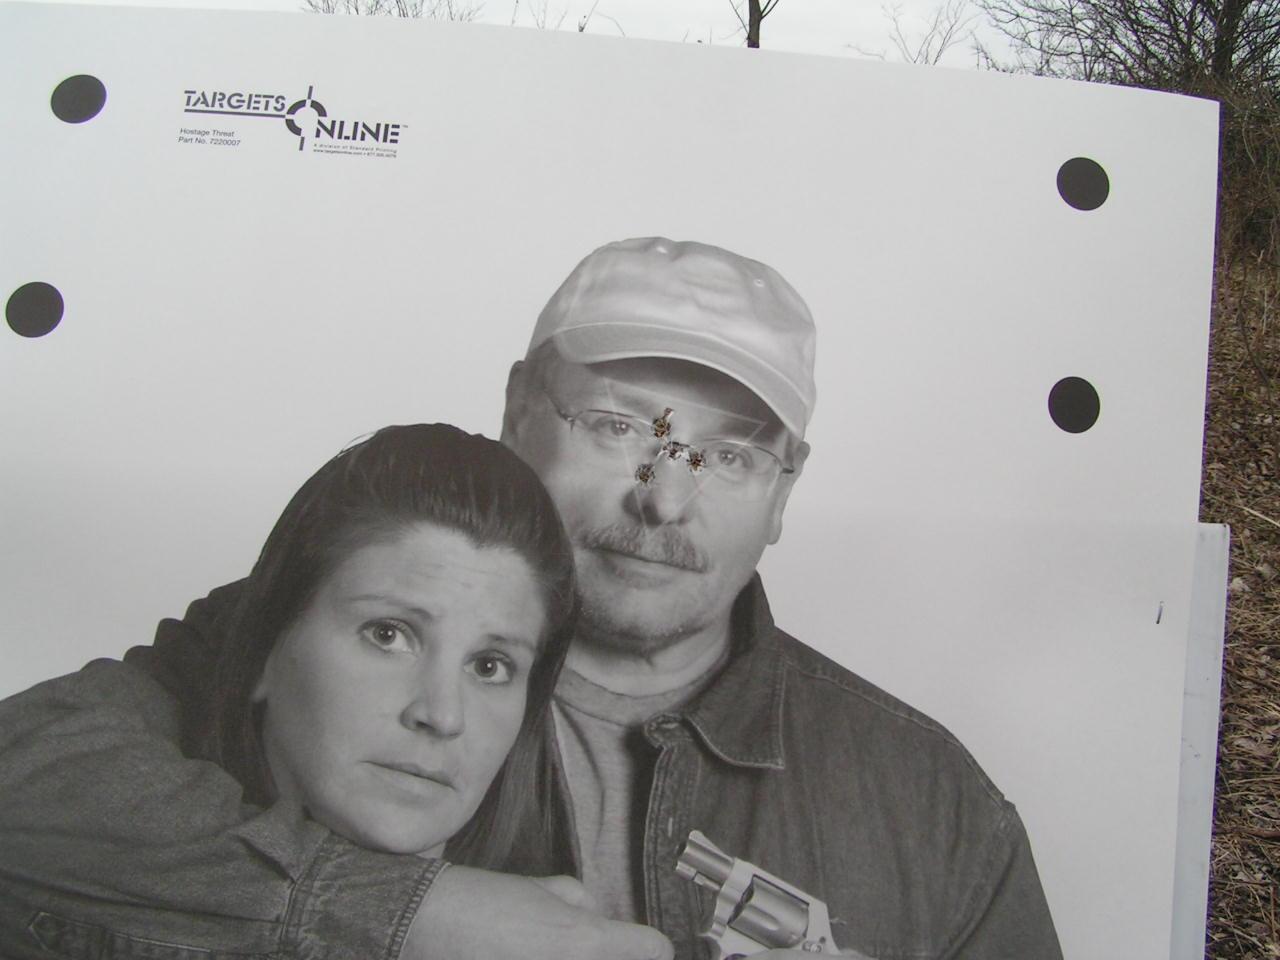 How Far Away Should I Take The Shot?-targetsonline-004.jpg